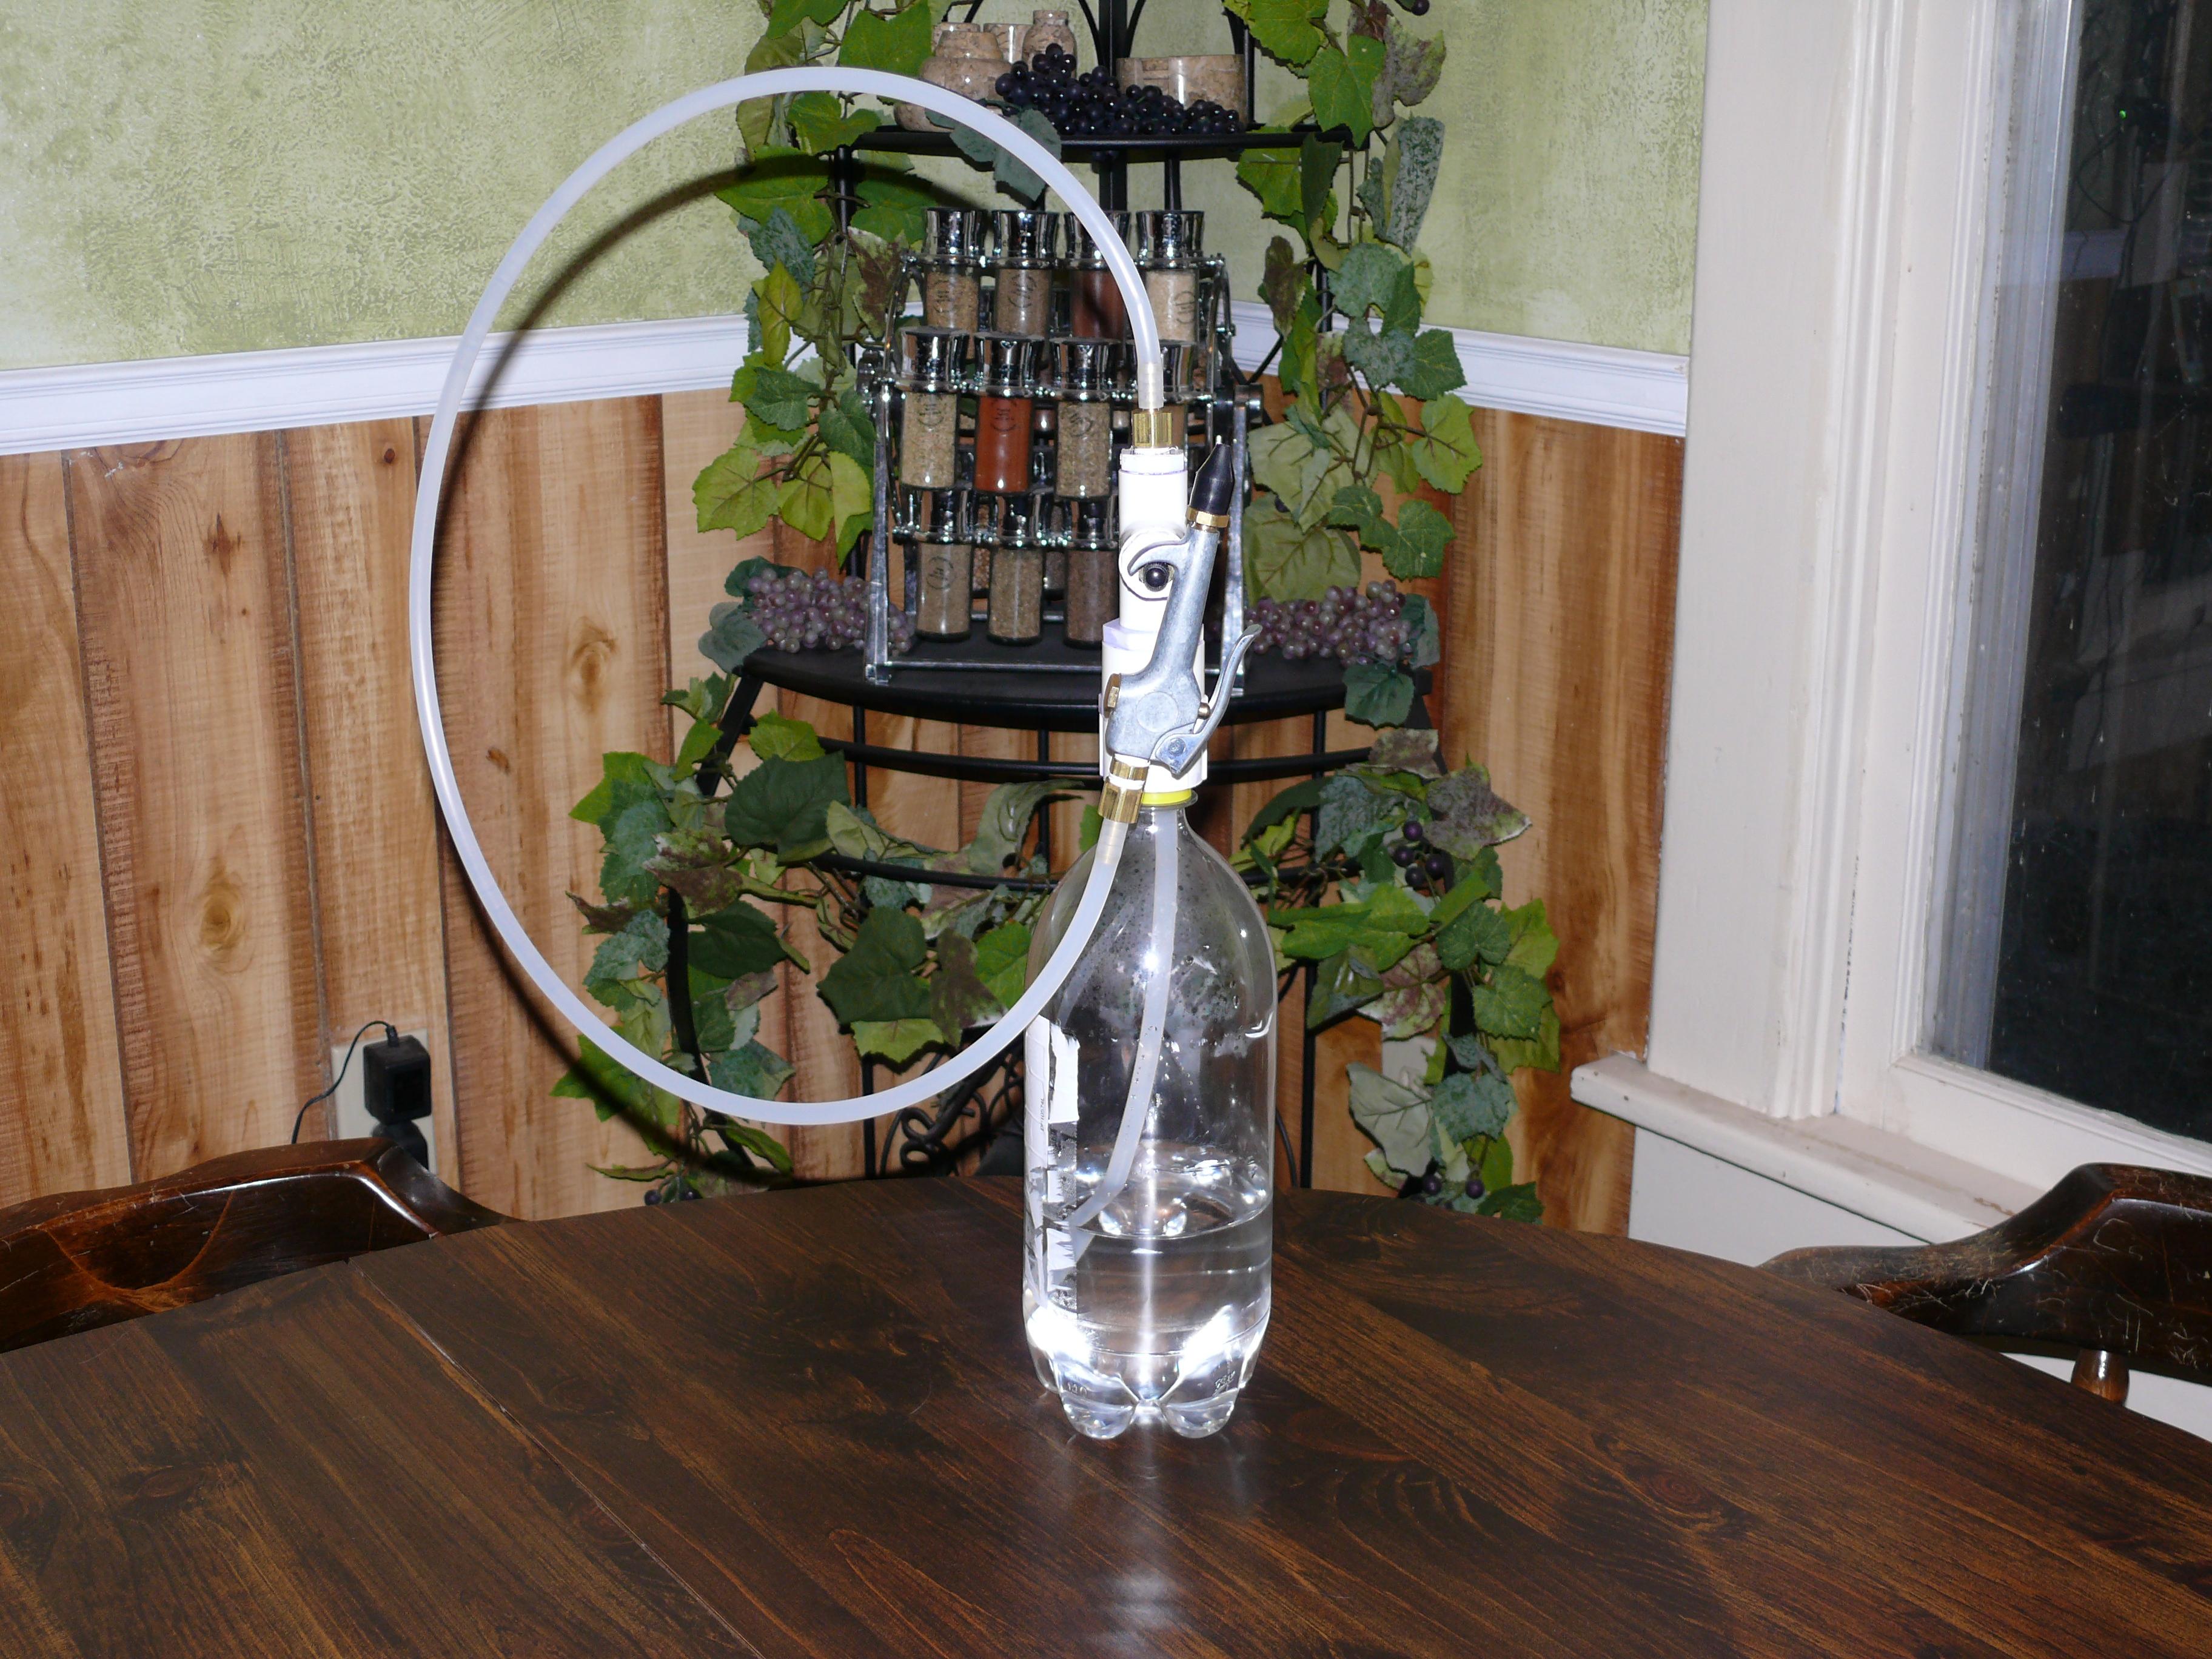 Pressurized Spray Bottle from old 2-liter